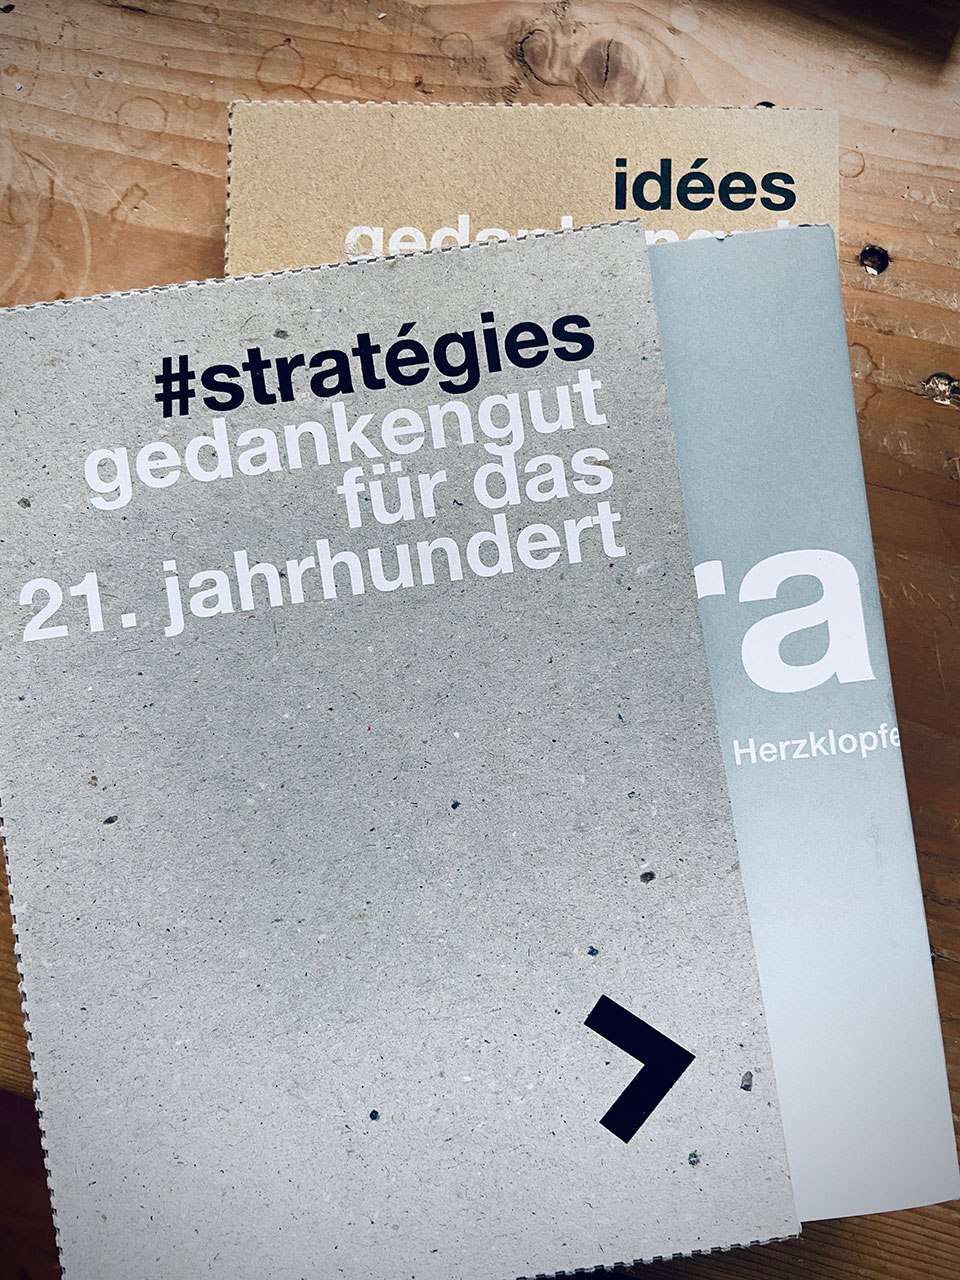 #stratégies Design hilft. Jetzt.